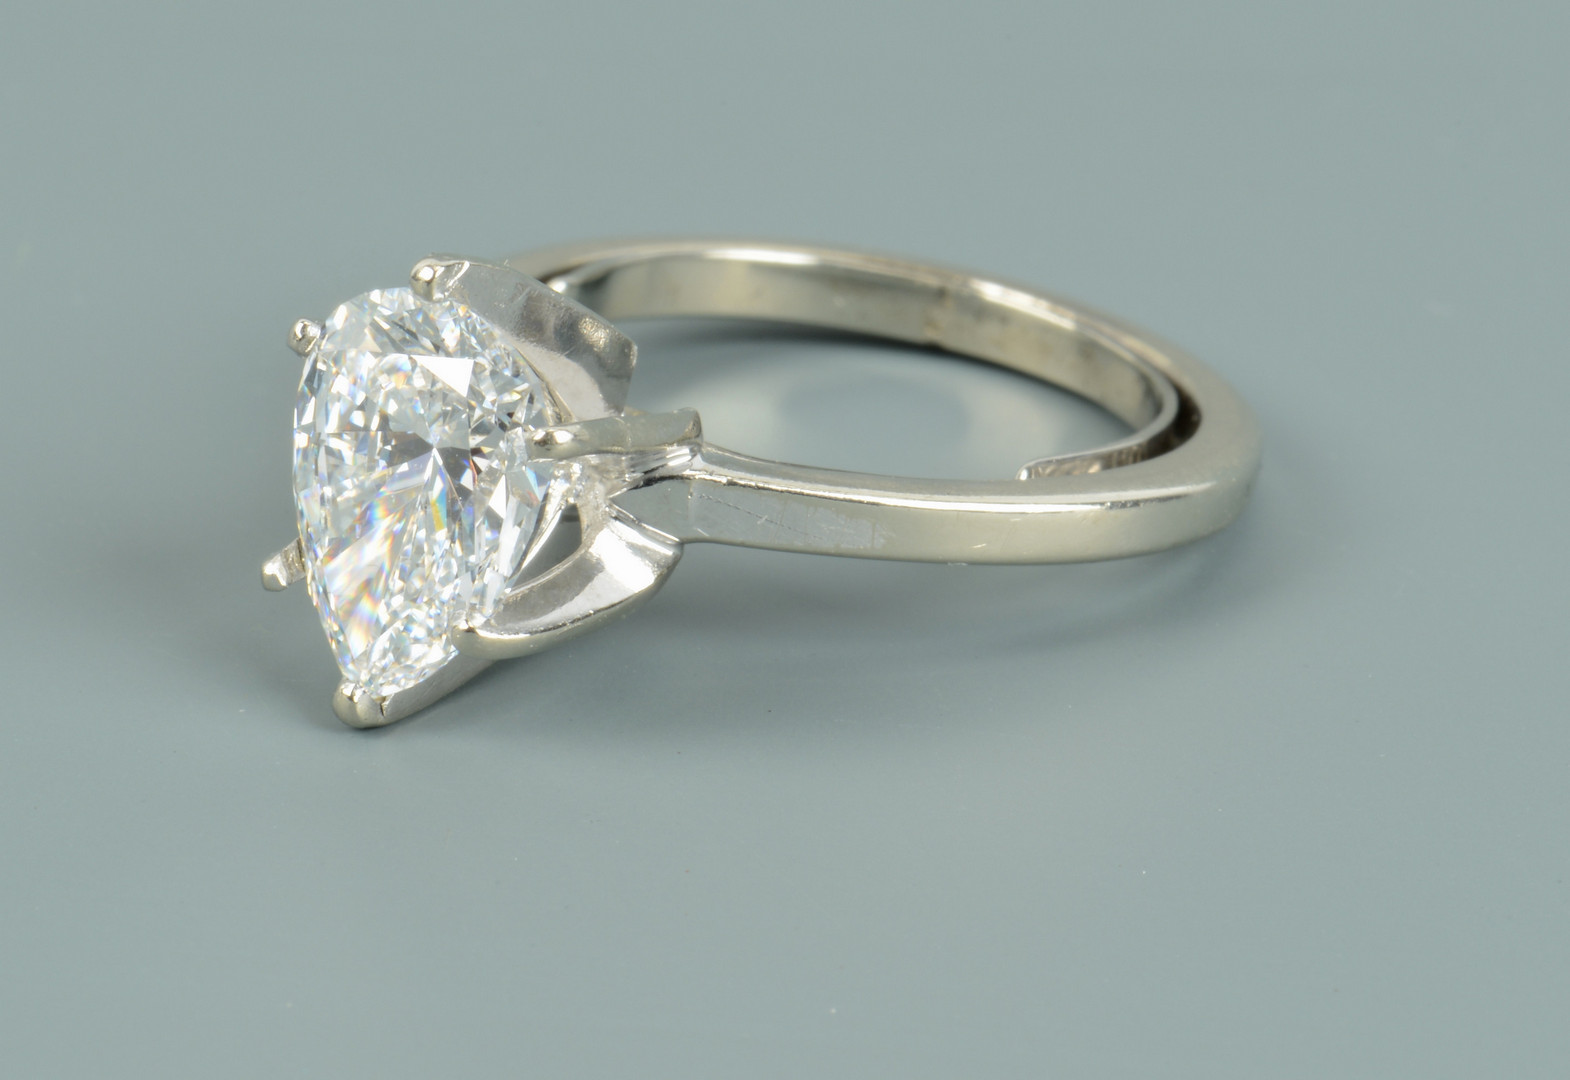 Lot 103: Pear-shaped D color diamond, GIA